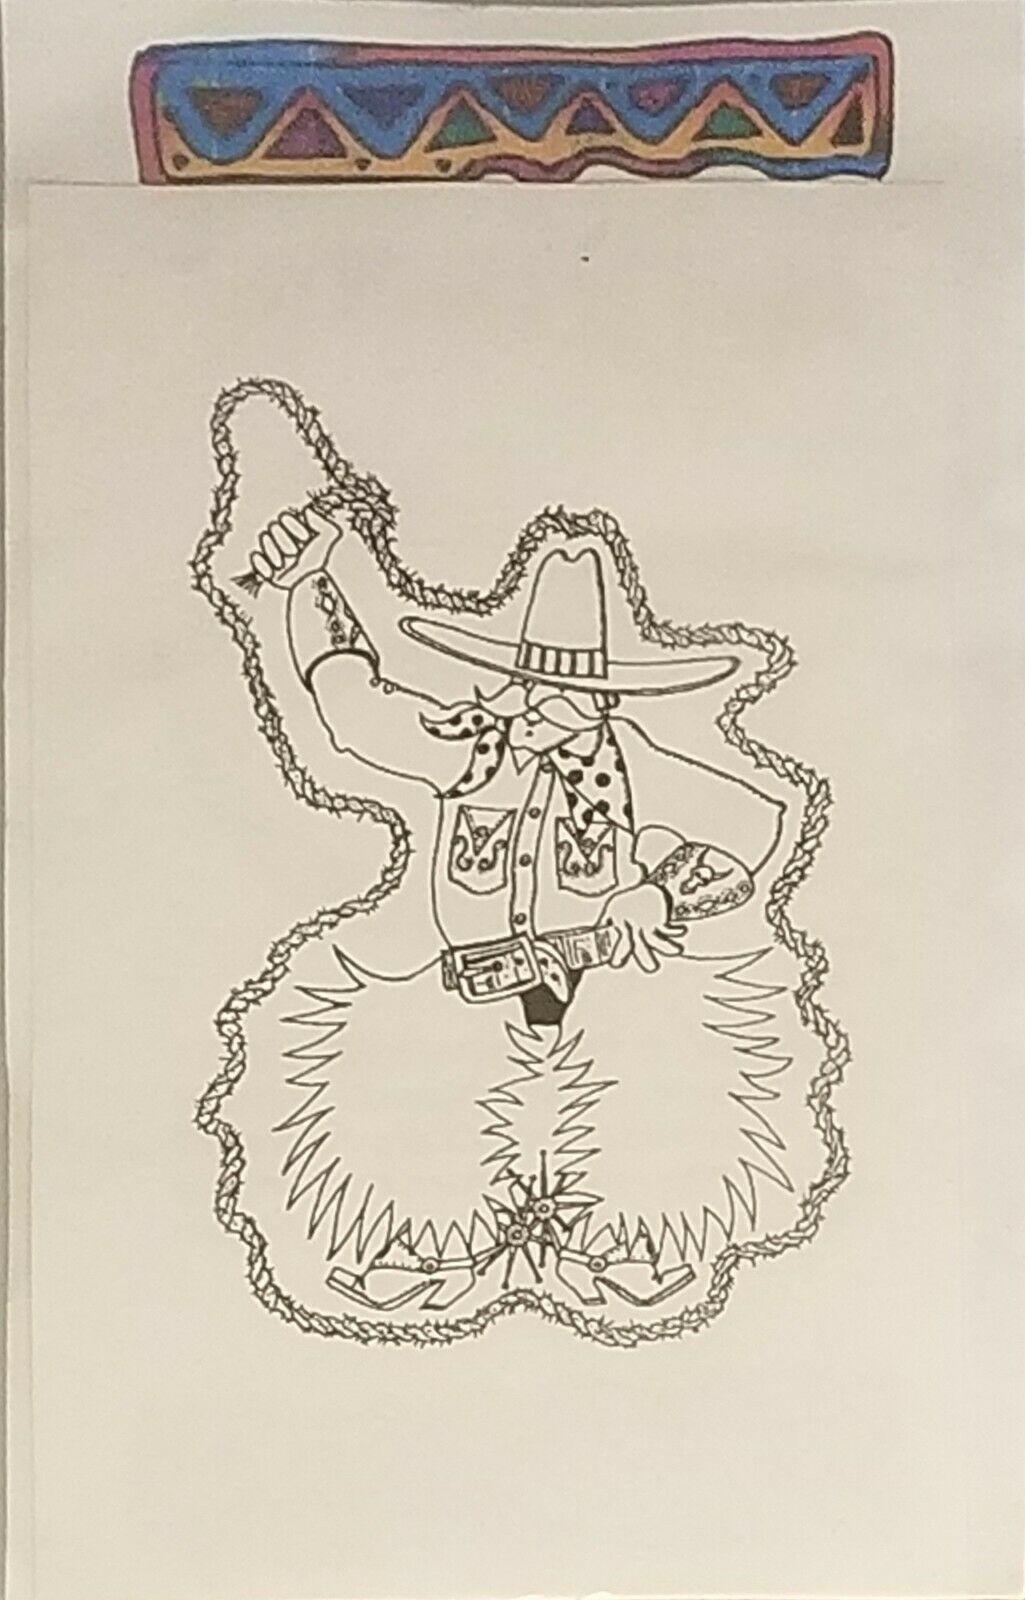 Terry Medaris Art Stamps Cowboy Unmounted Rubber Stamp